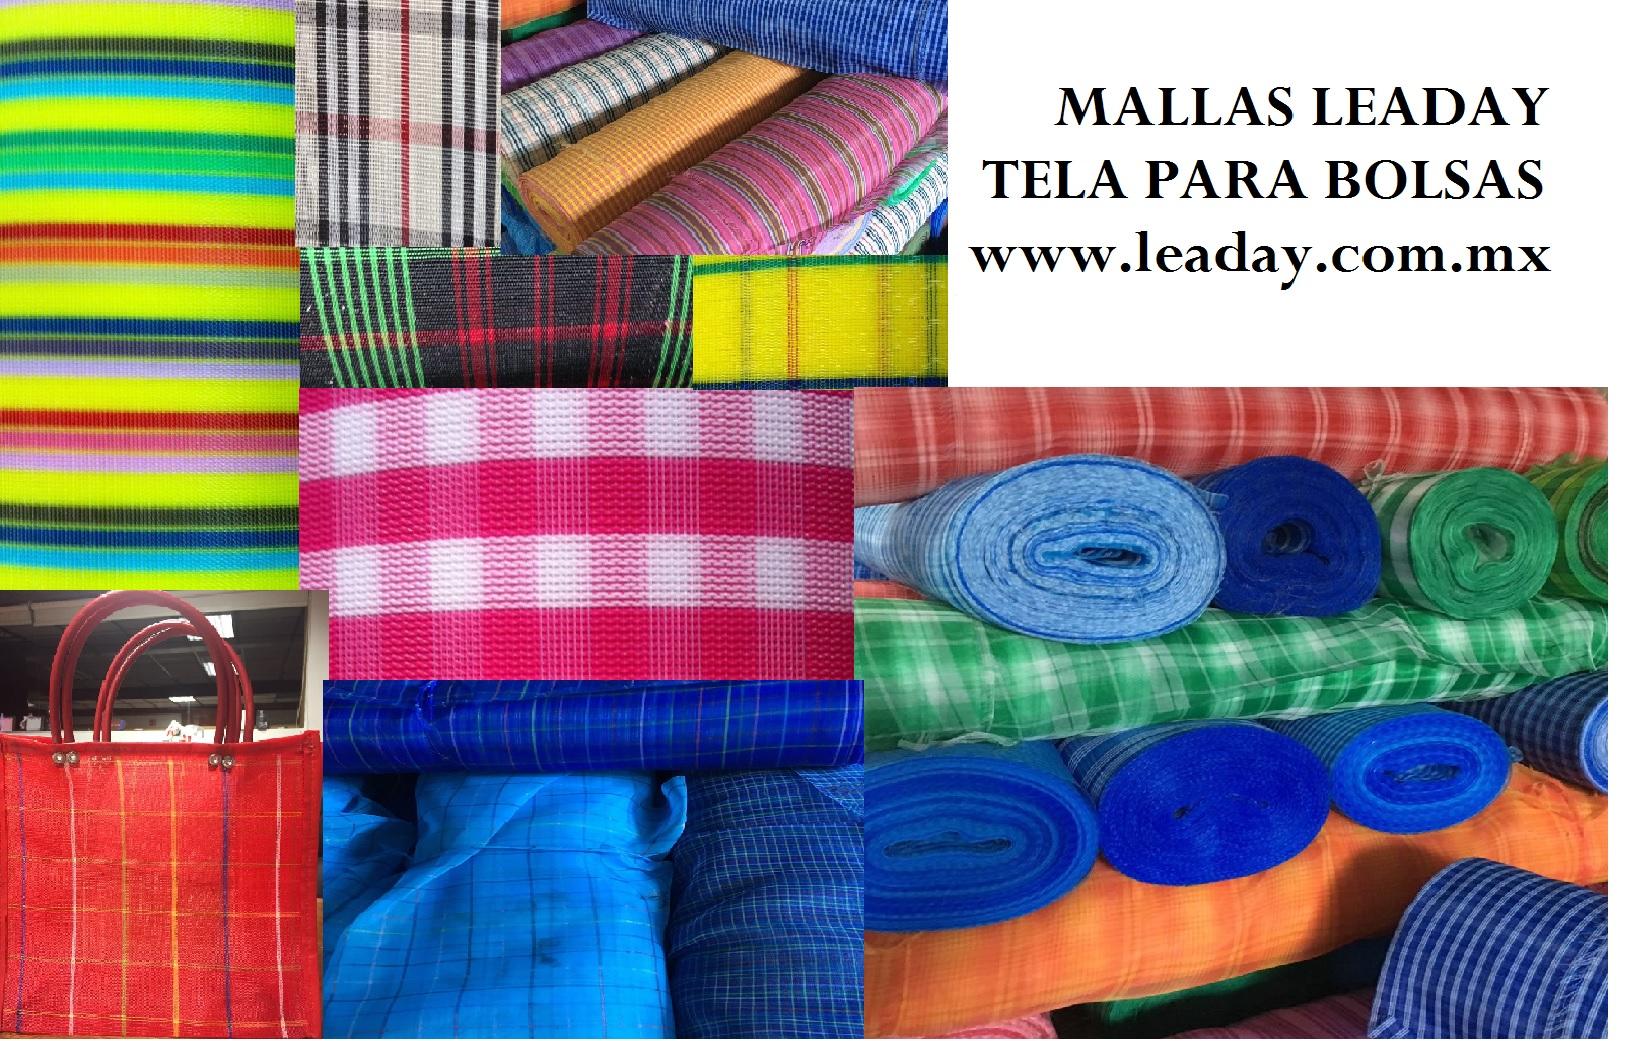 Blog de distribuidora d leaday mallas pl sticas malla - Mallas de plastico ...